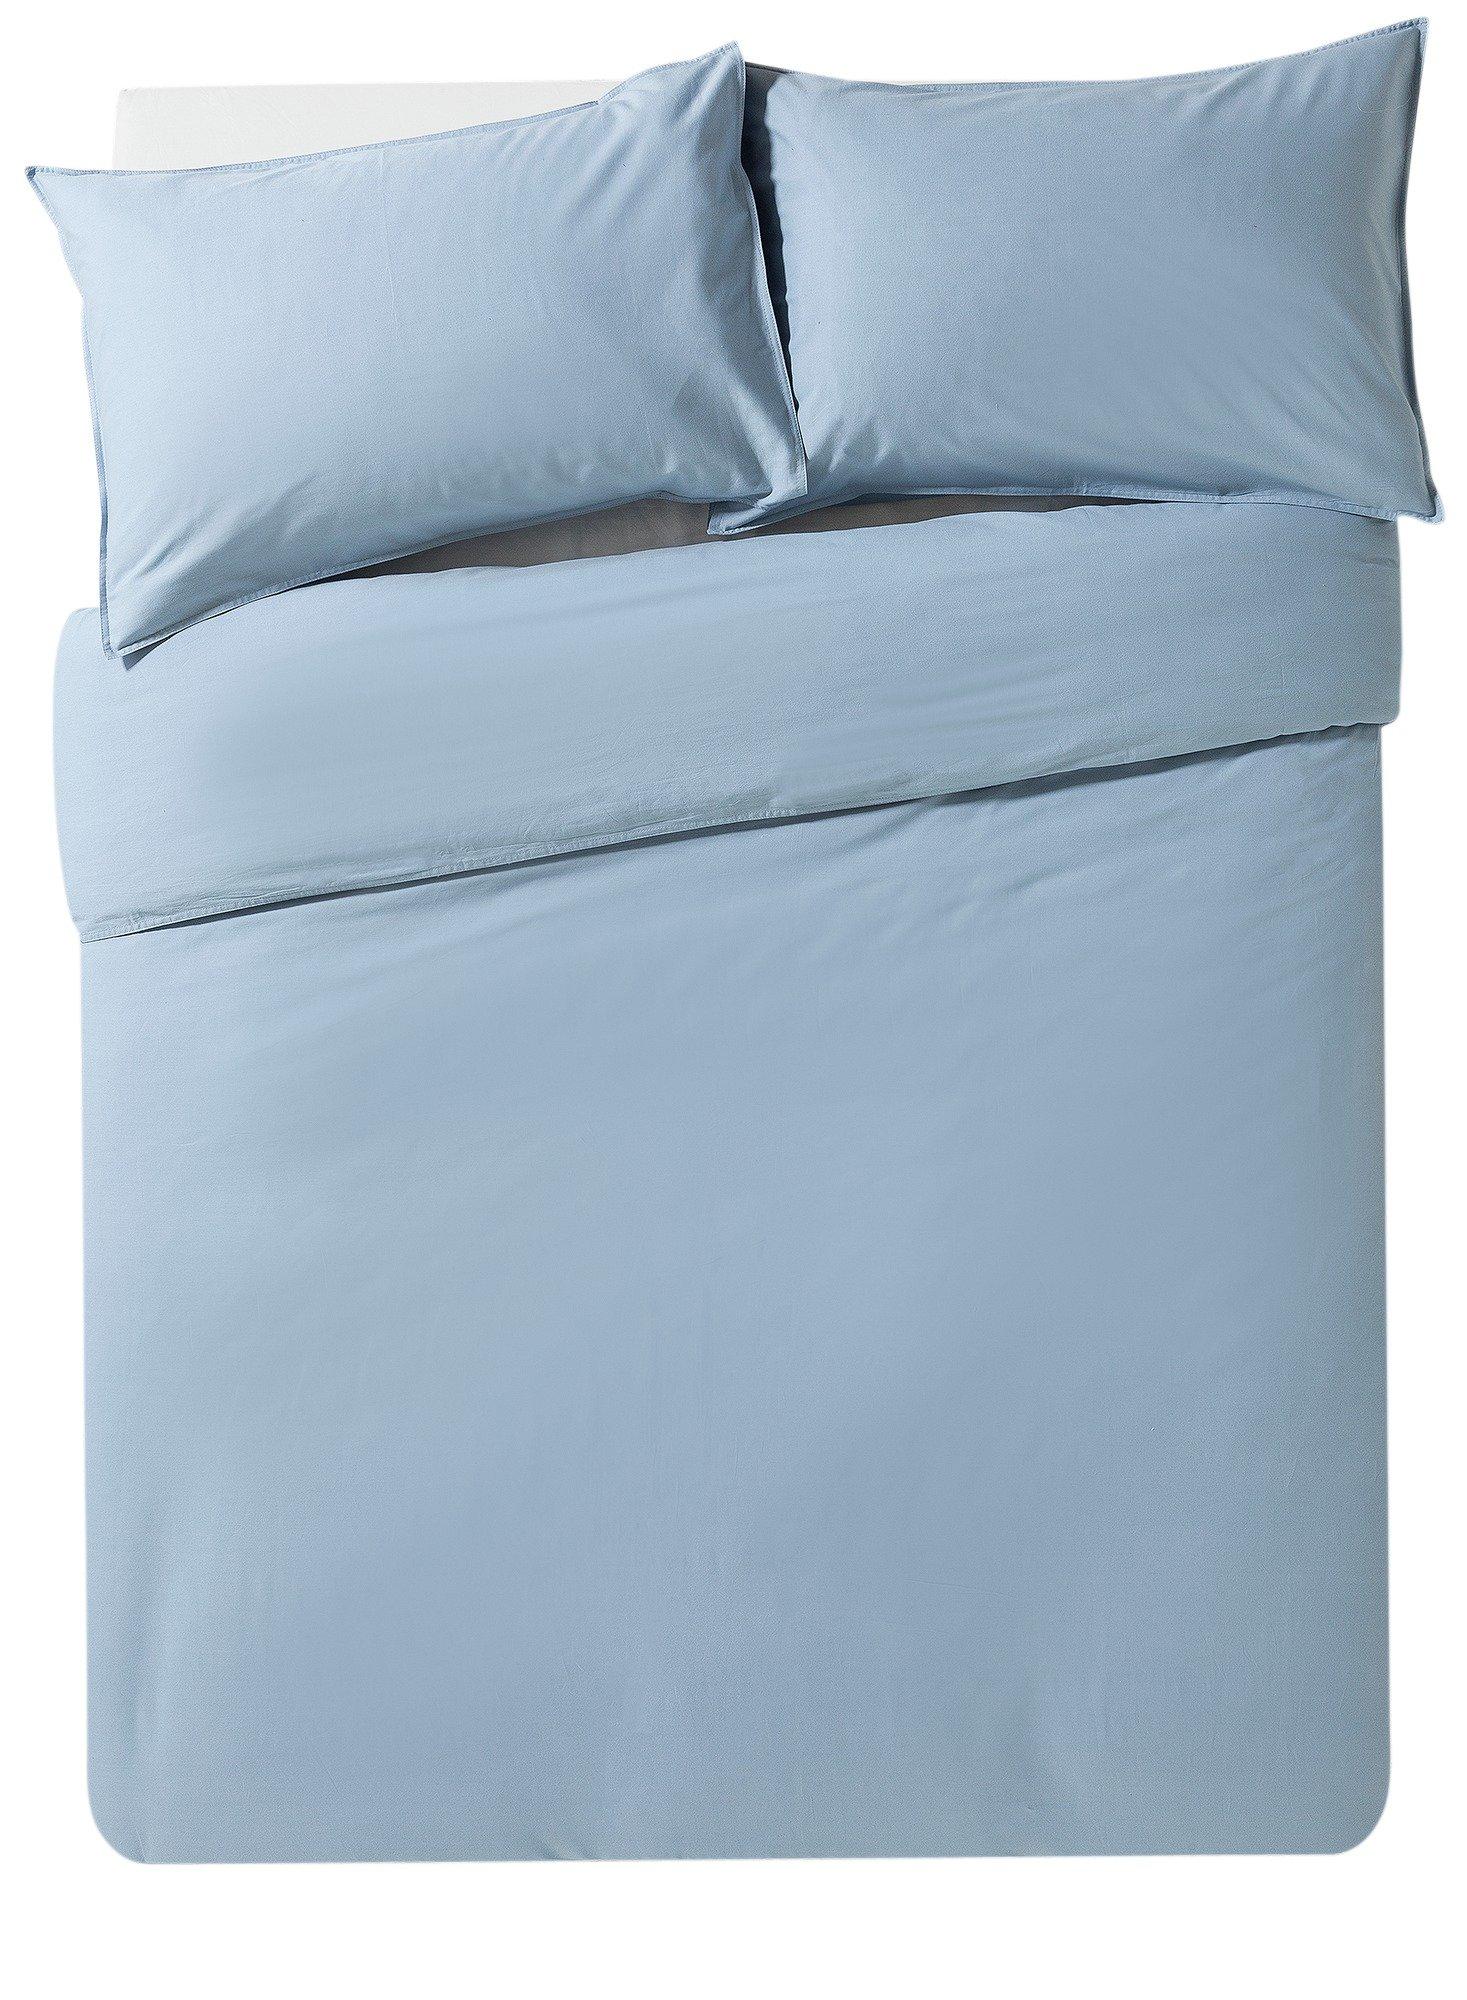 Hygena Blue Washed Cotton Bedding Set - Superking.